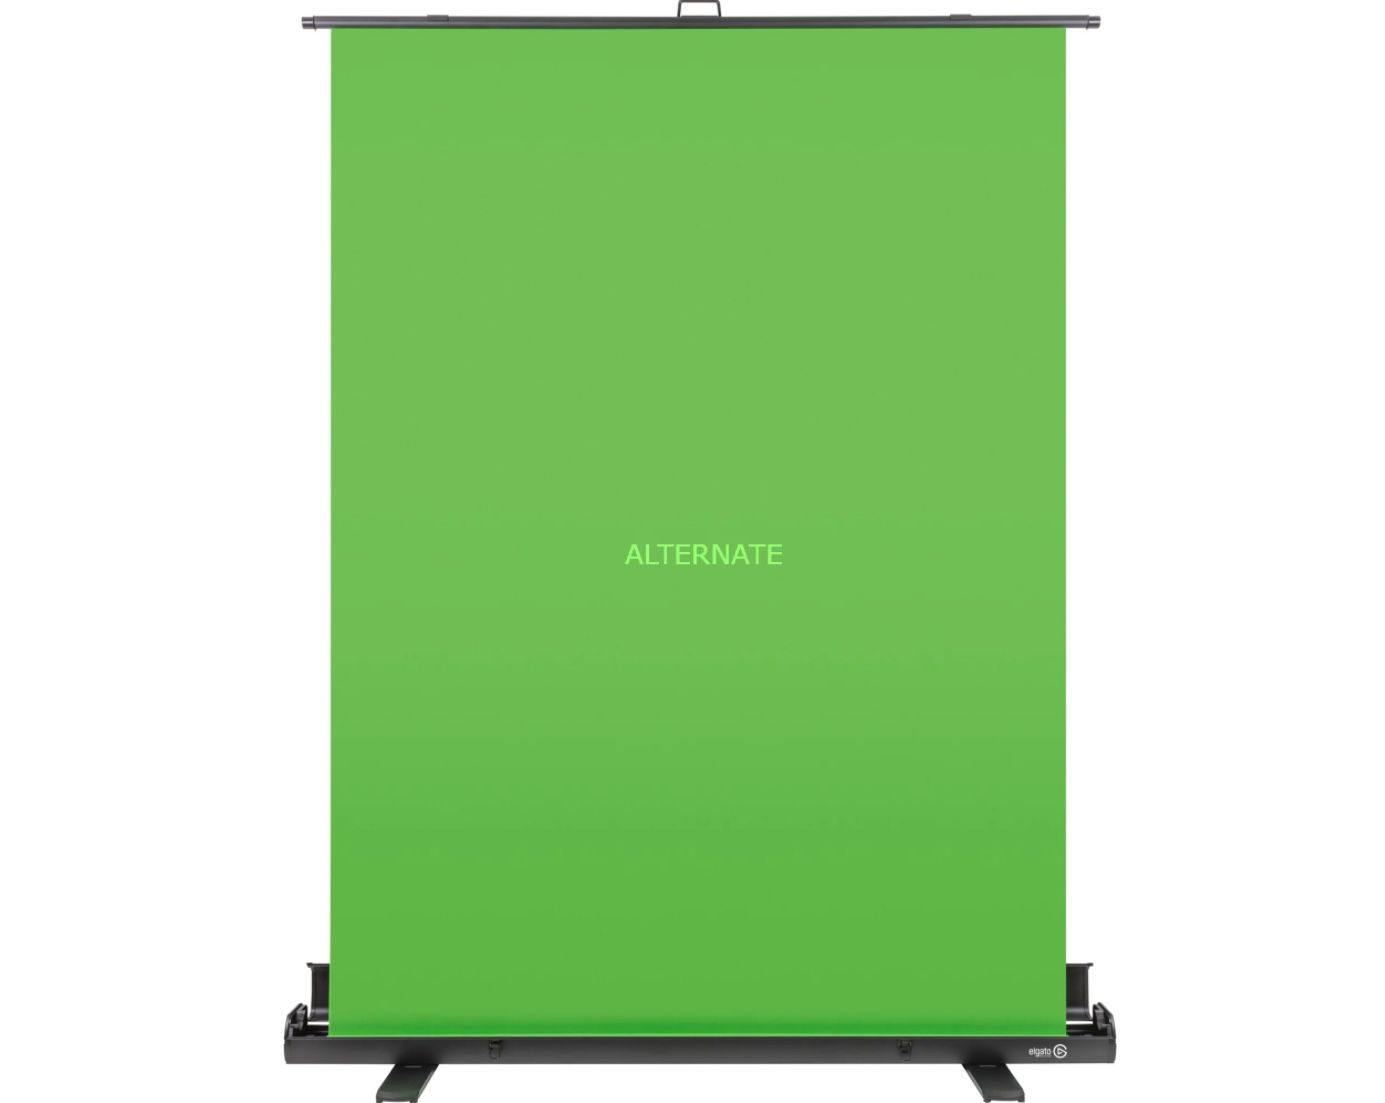 Elgato Green Screen Rolloleinwand für 119,99€ (statt 138€)